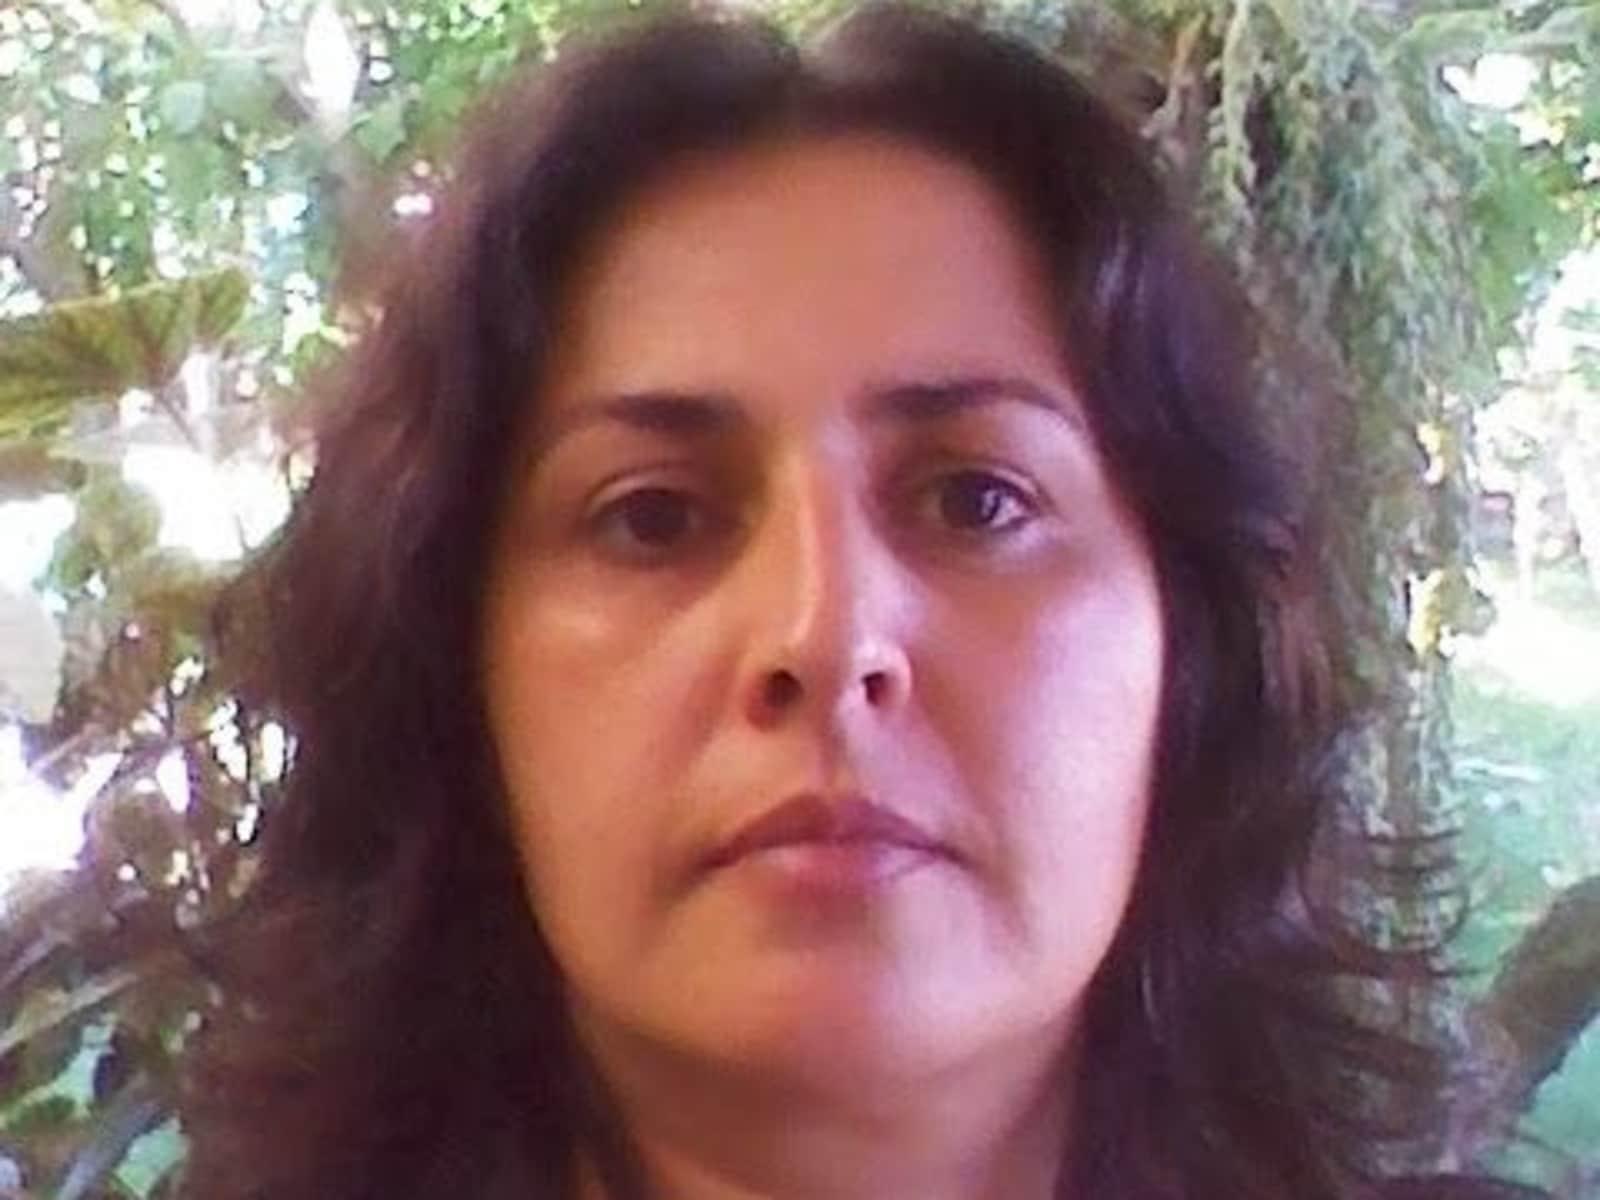 Elizabeth from Melbourne, Victoria, Australia